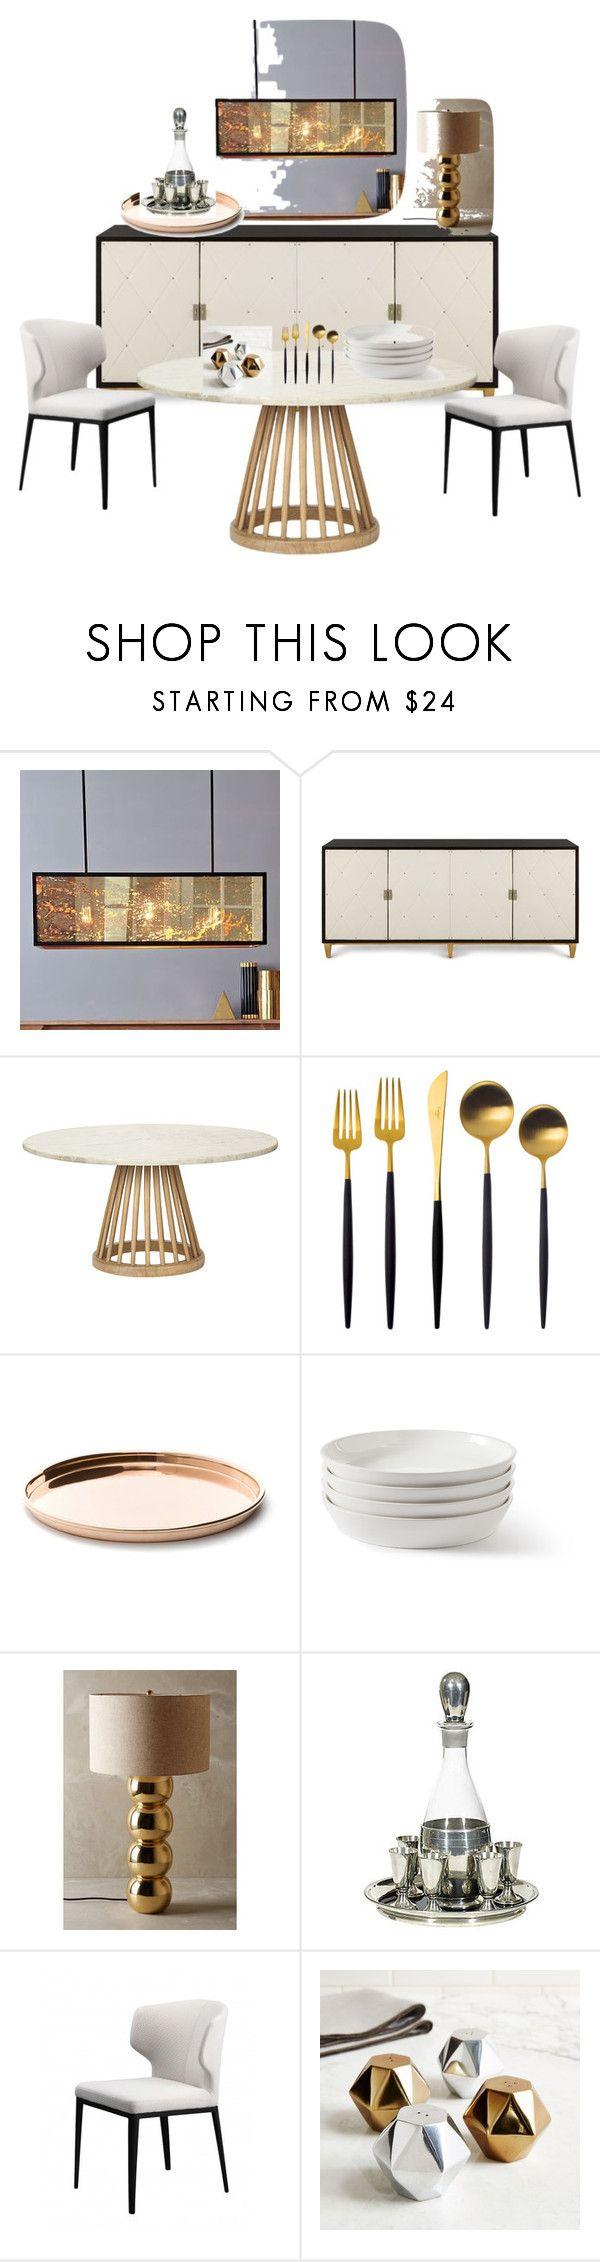 Modern Glam Dining by passionatemae on Polyvore featuring interior, interiors, interior design, home, home decor, interior decorating, Bernhardt, Tom Dixon, West Elm and Cutipol